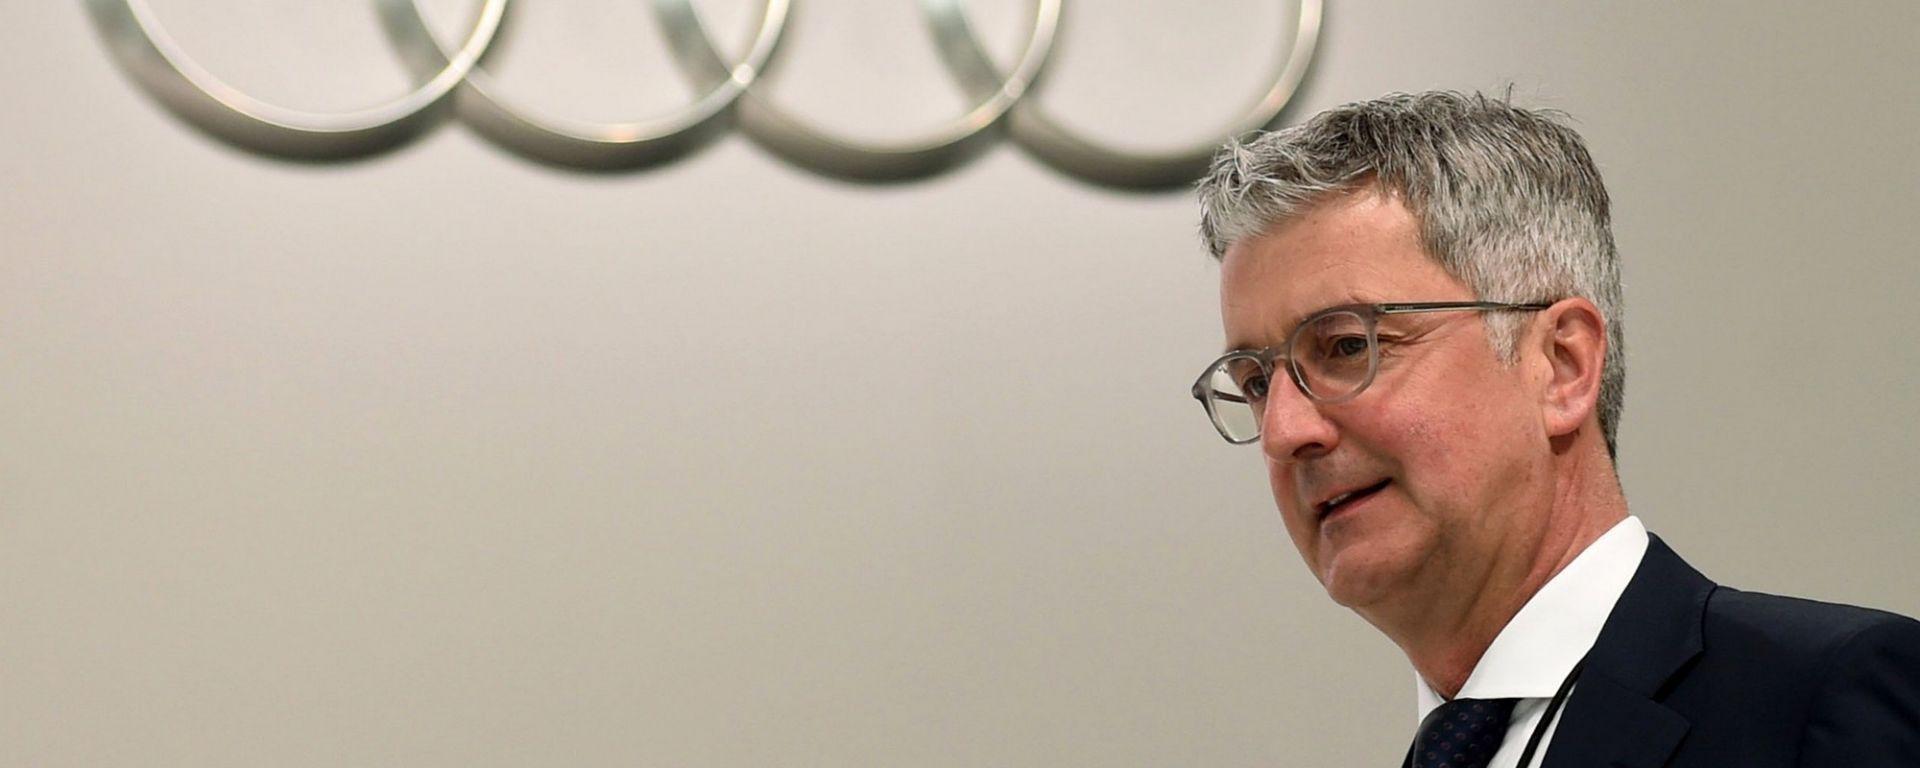 Rupert Stadler, ex Ceo Audi